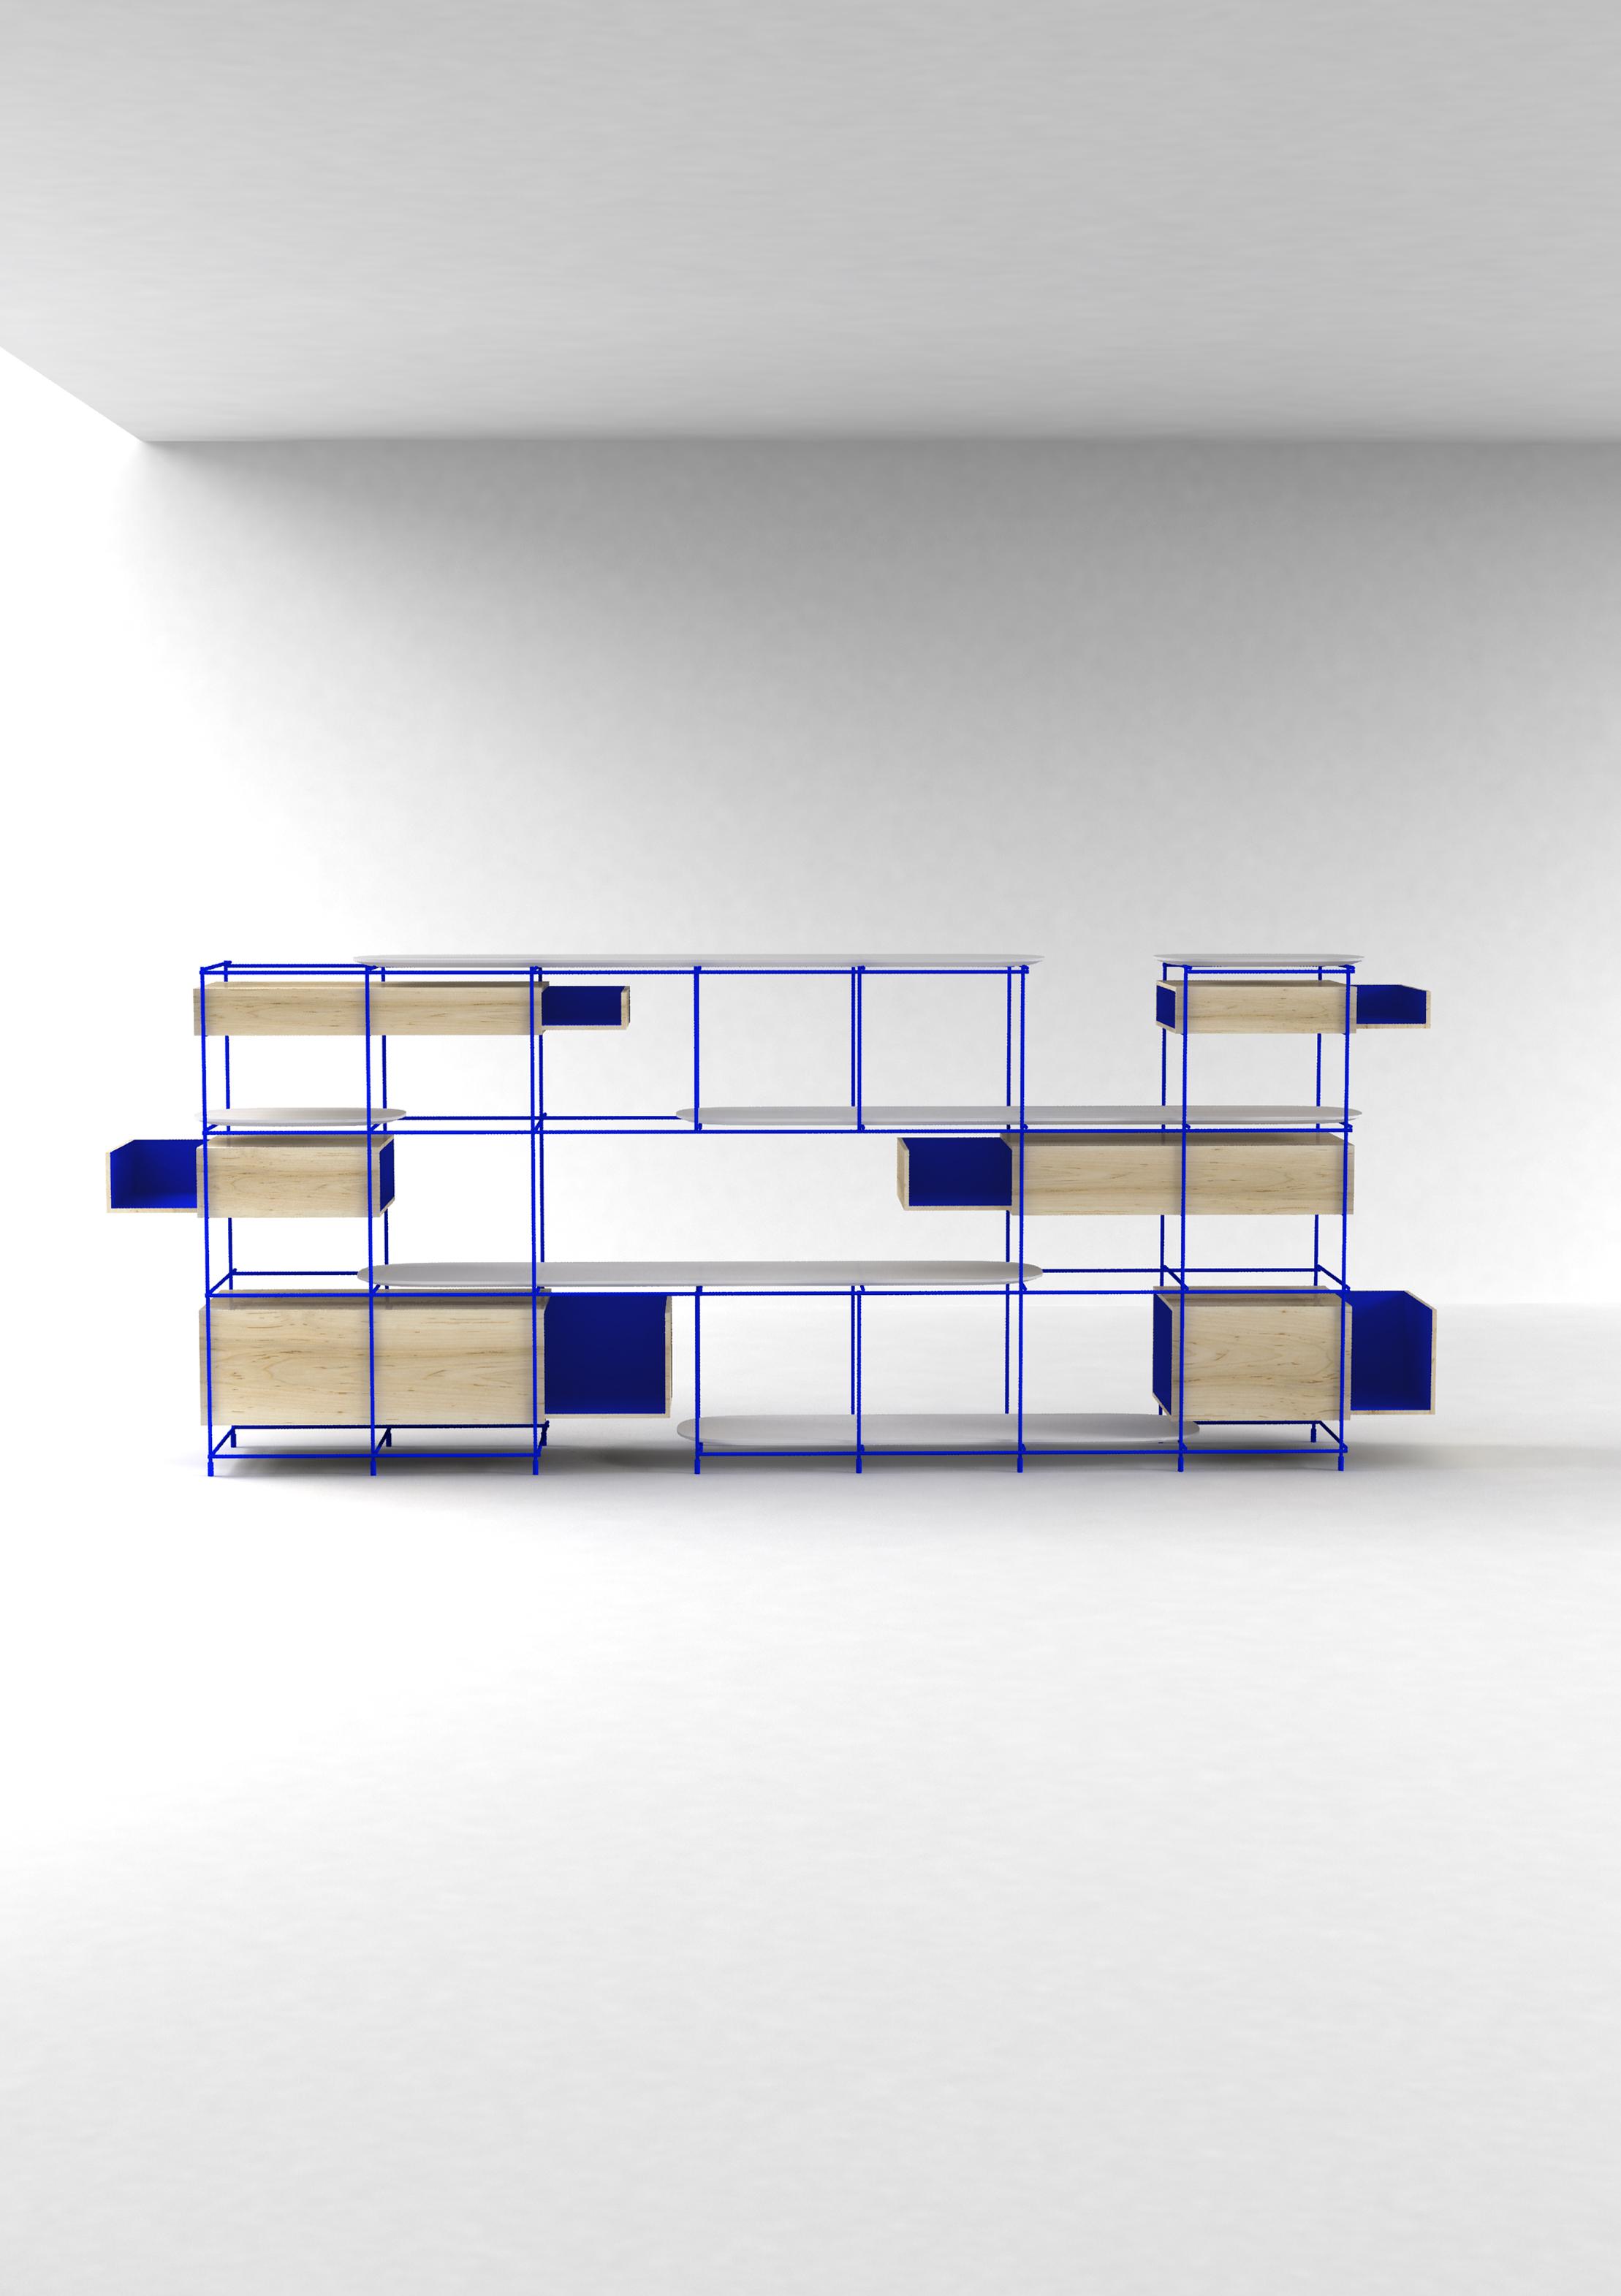 Cabinet_A+A Cooren_ambiance1-2.jpg